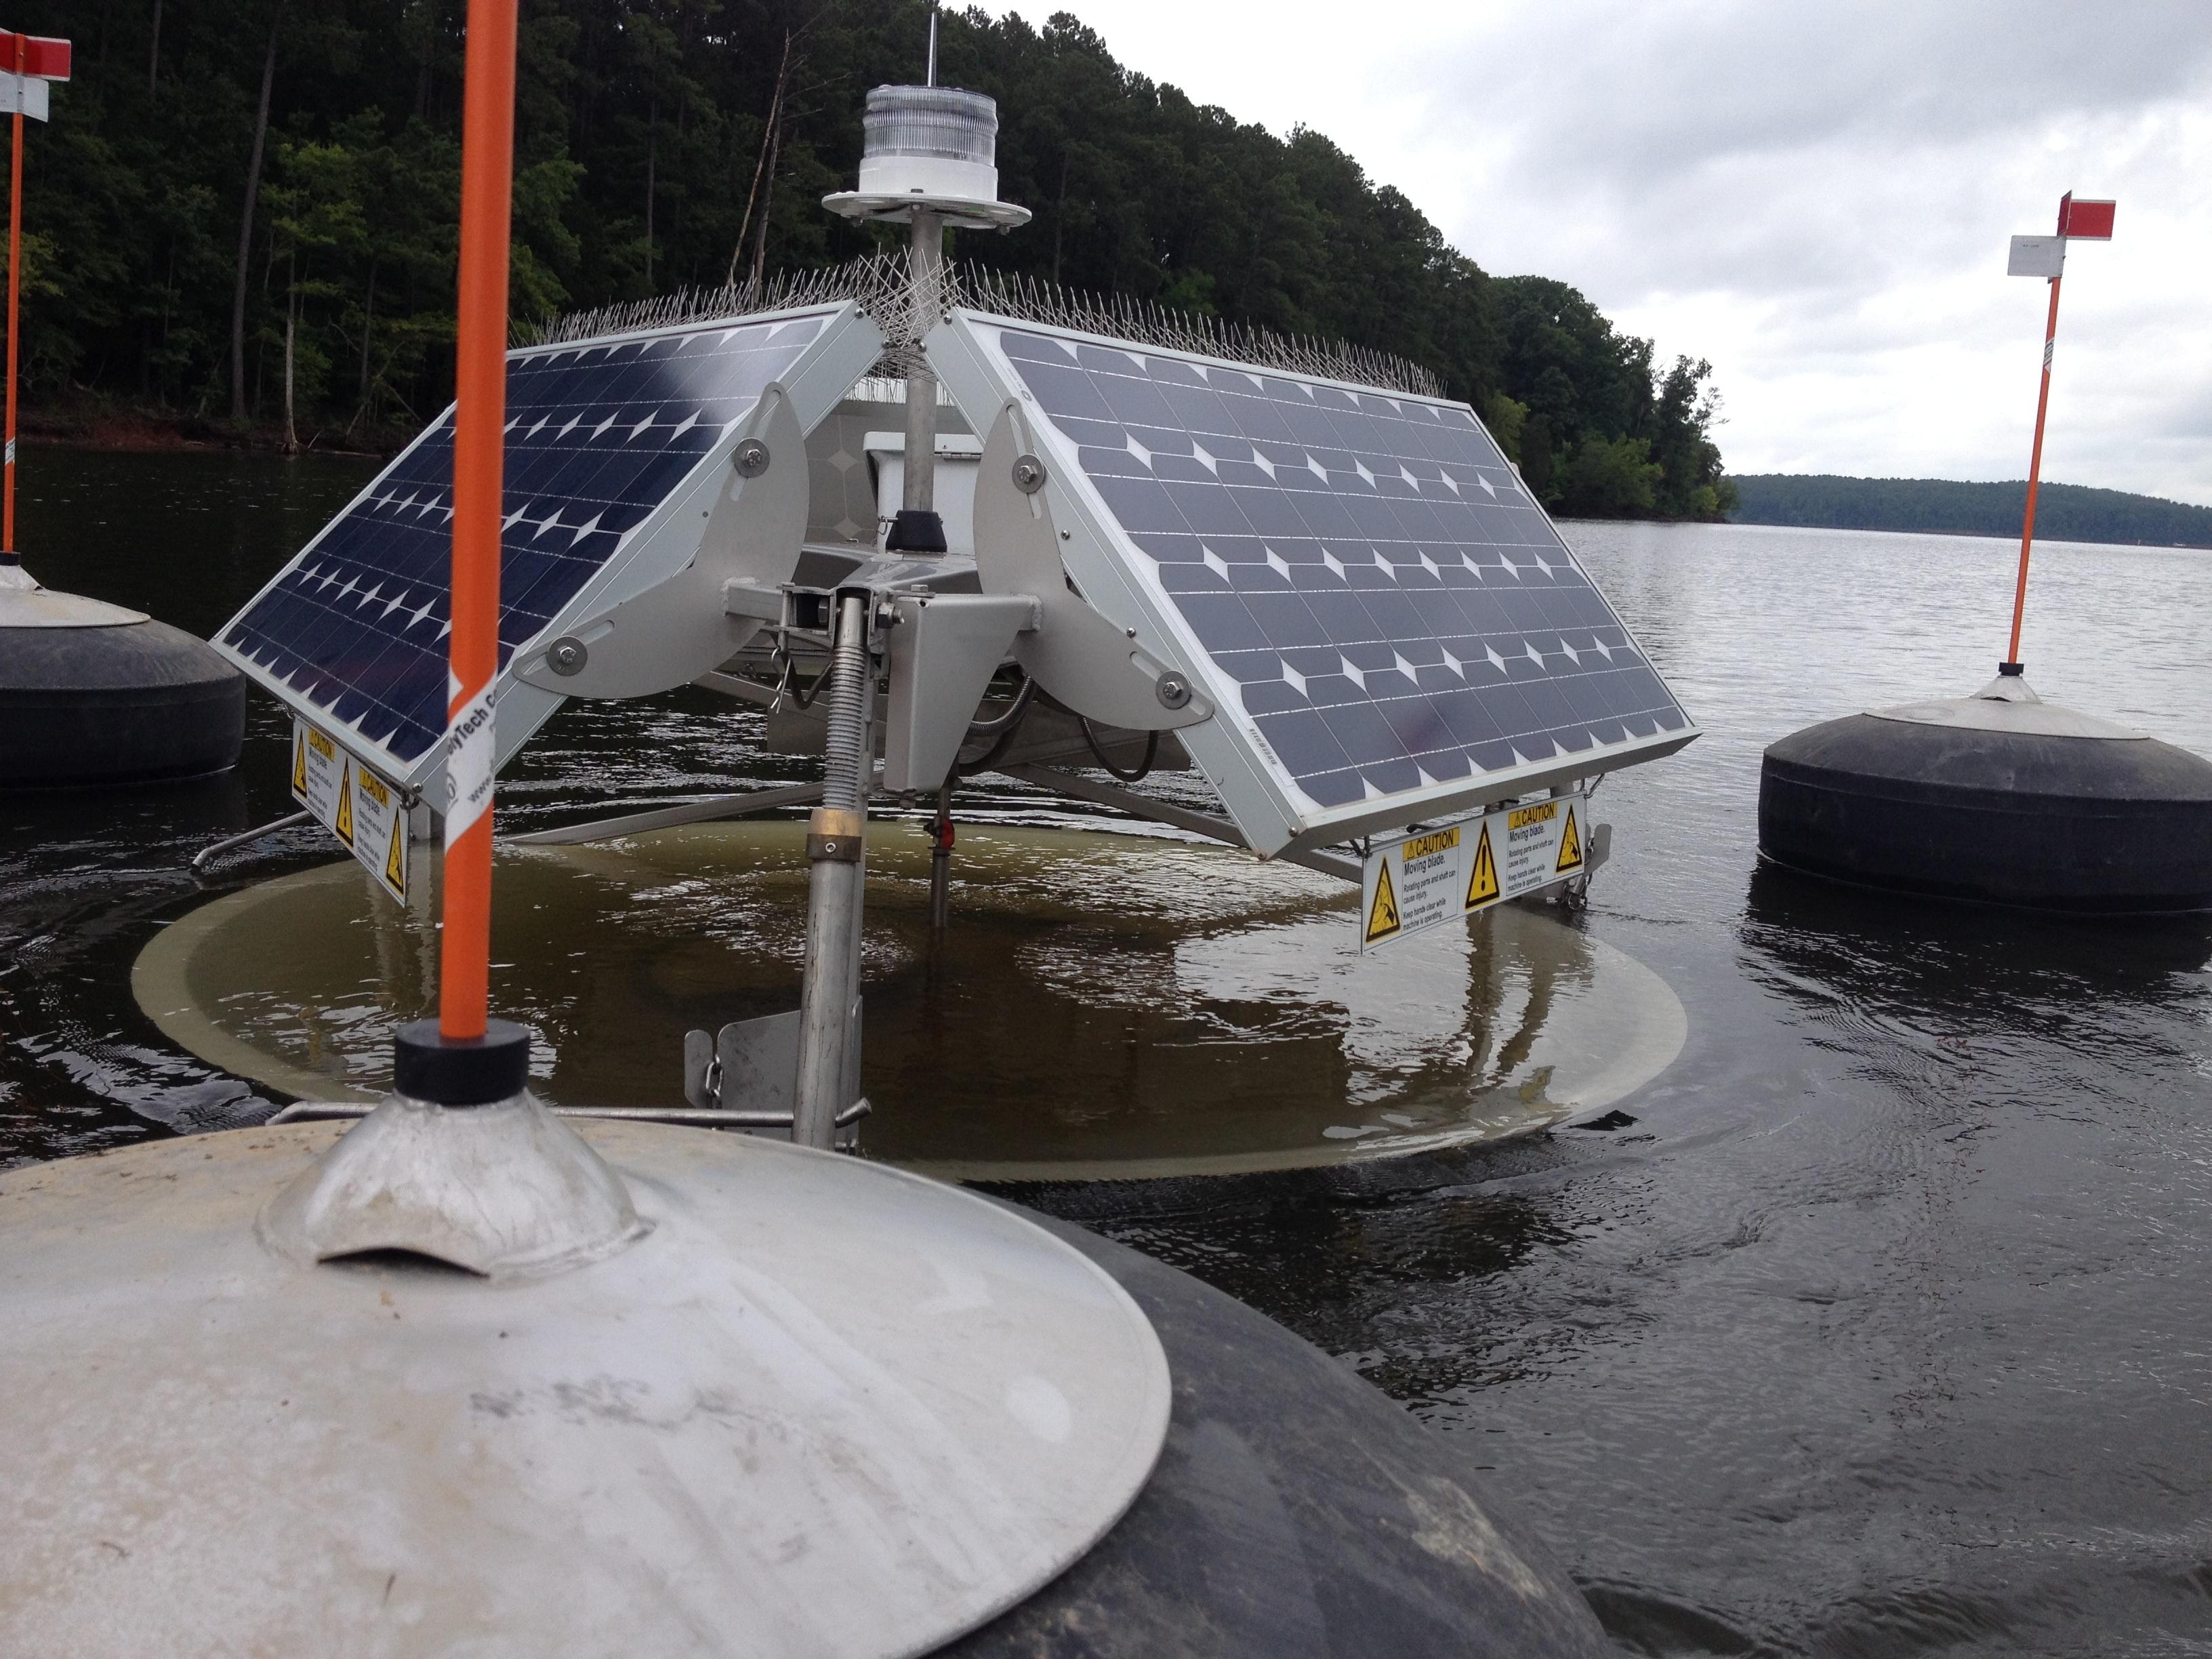 Solar Bees were used unsuccessfully in Jordan Lake to prevent algae blooms. Photo: Duke University